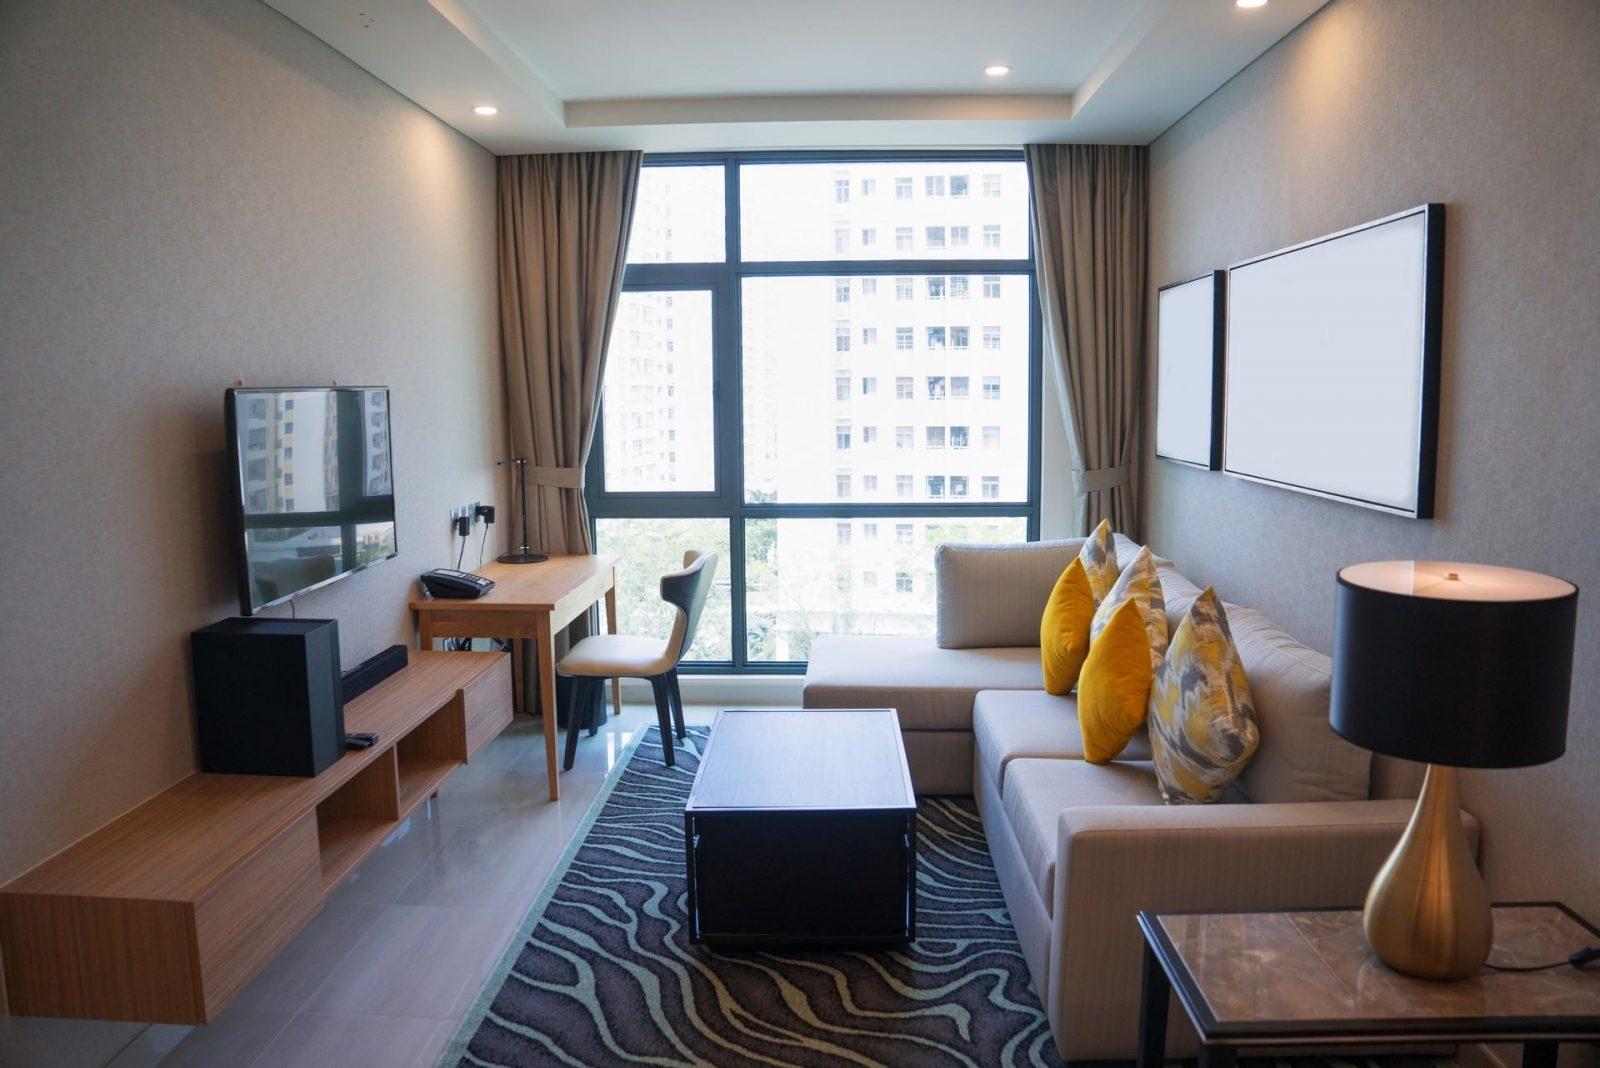 Cozy living room interior design with panoramic window